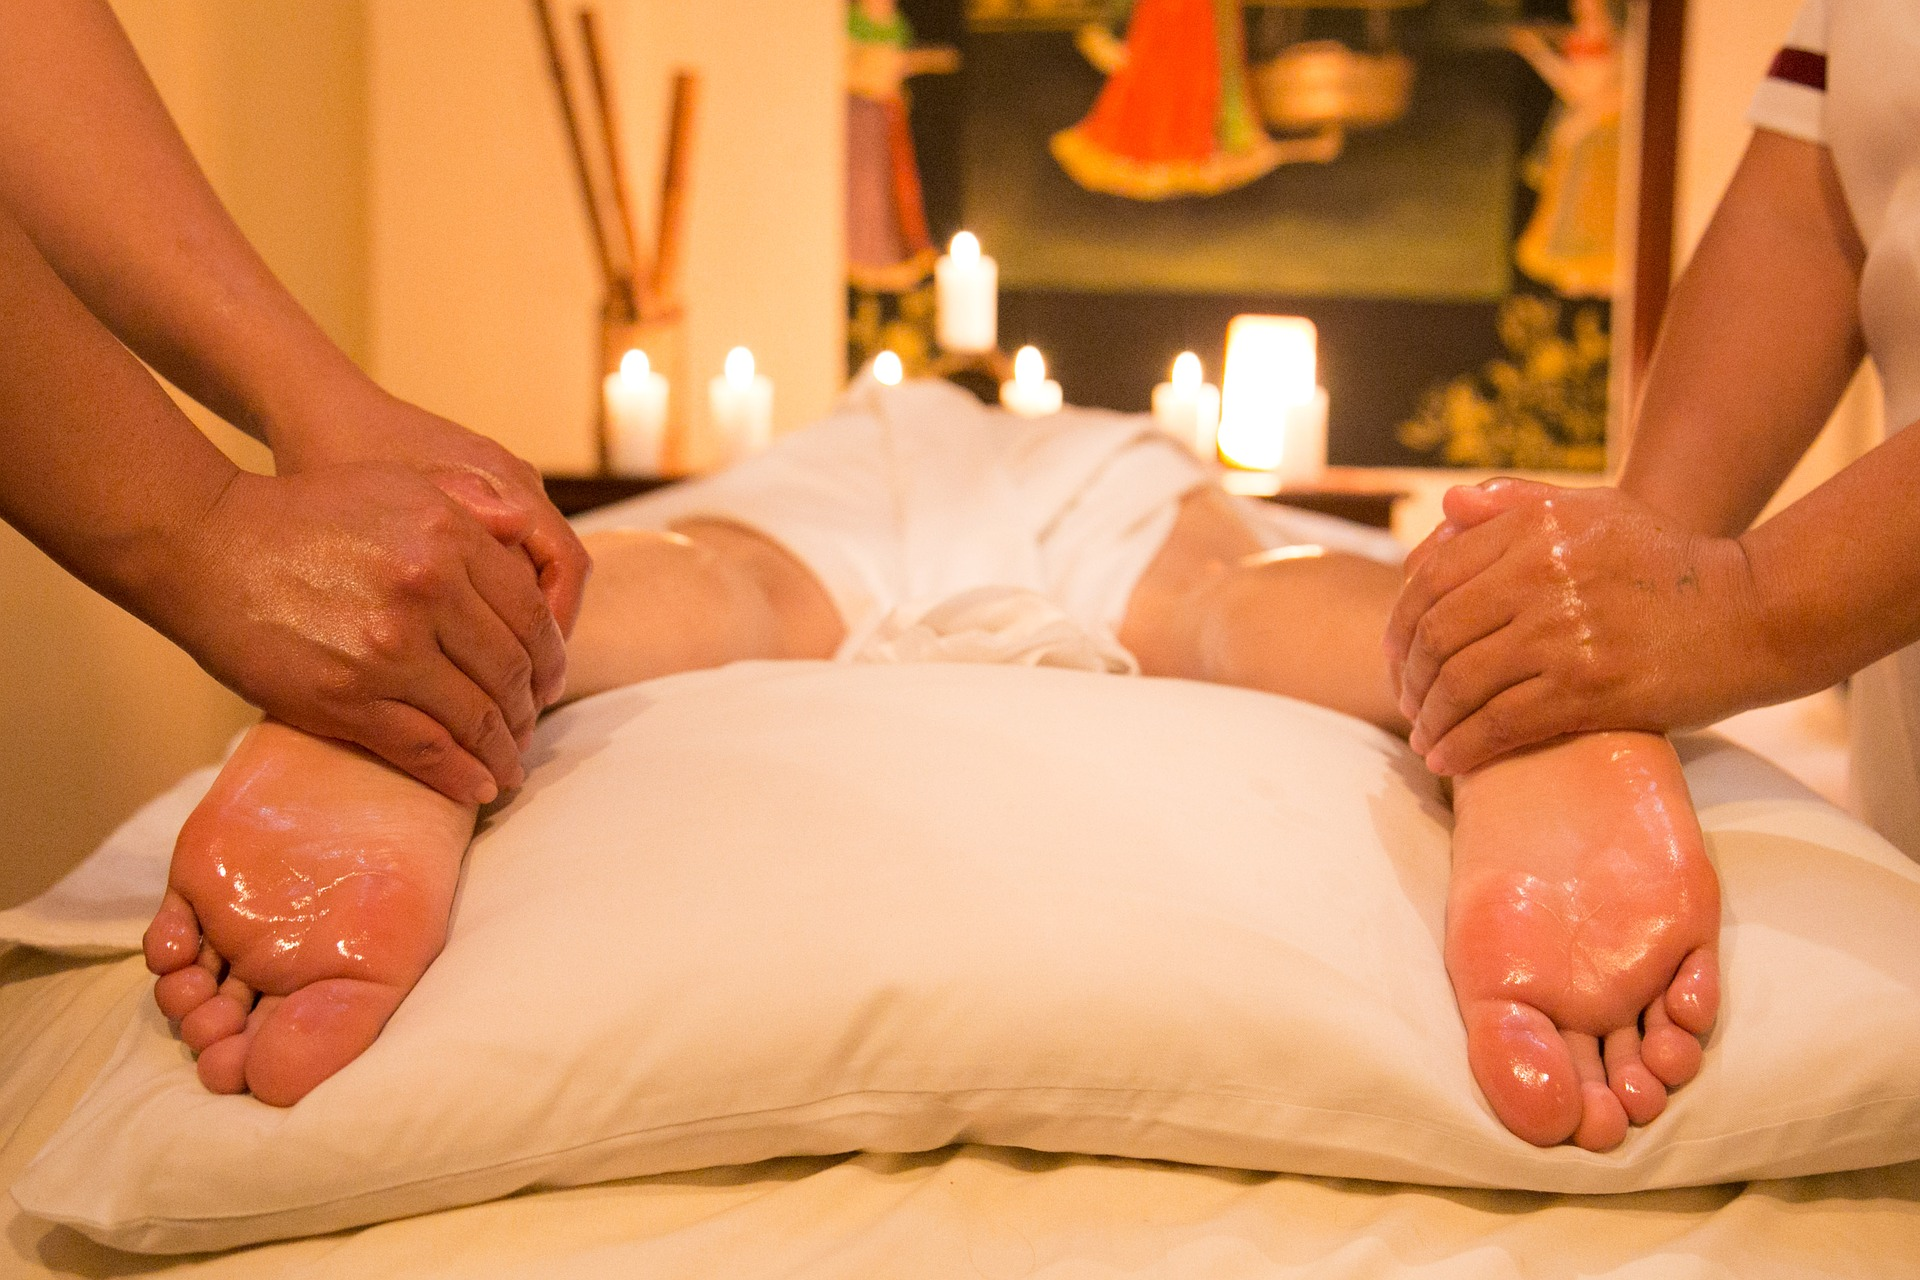 Burgemeester beëindigt bedrijfsvoering Arnhemse massagesalon